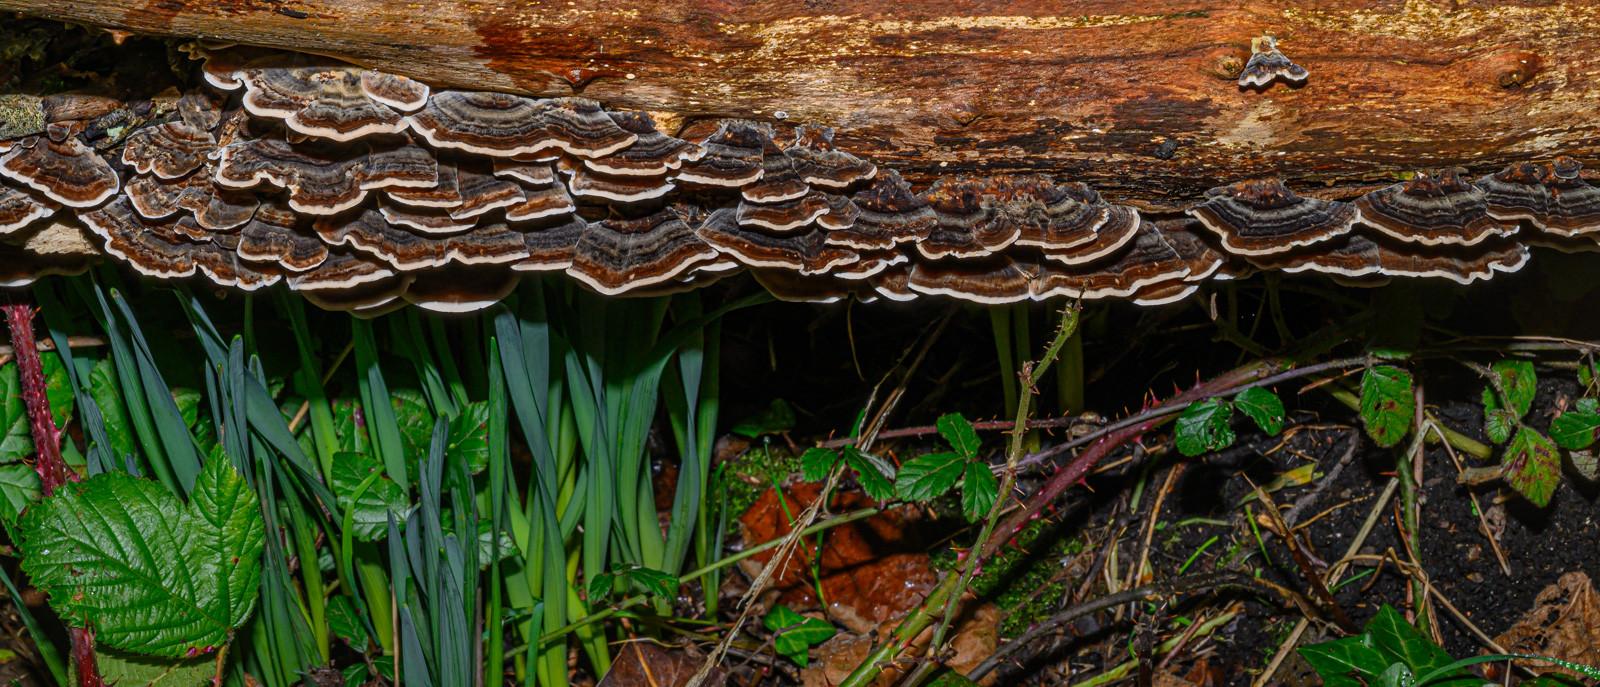 Fallen Tree Fungi